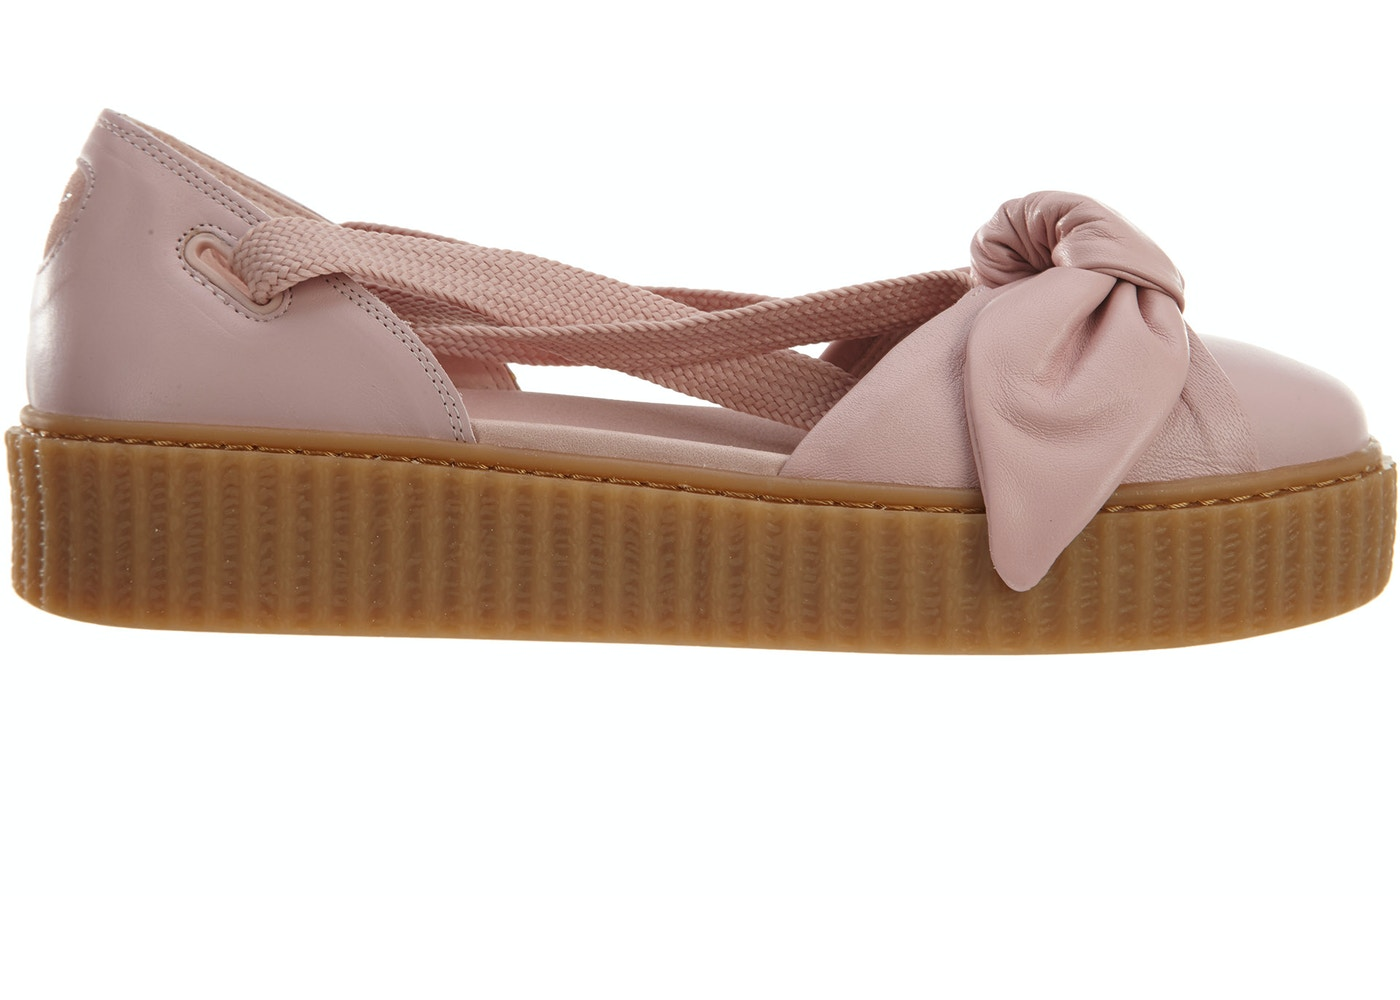 448eb911839b Puma Bow Creeper Sandal Silver Pink Pink-Oatmeal (W) - 365794